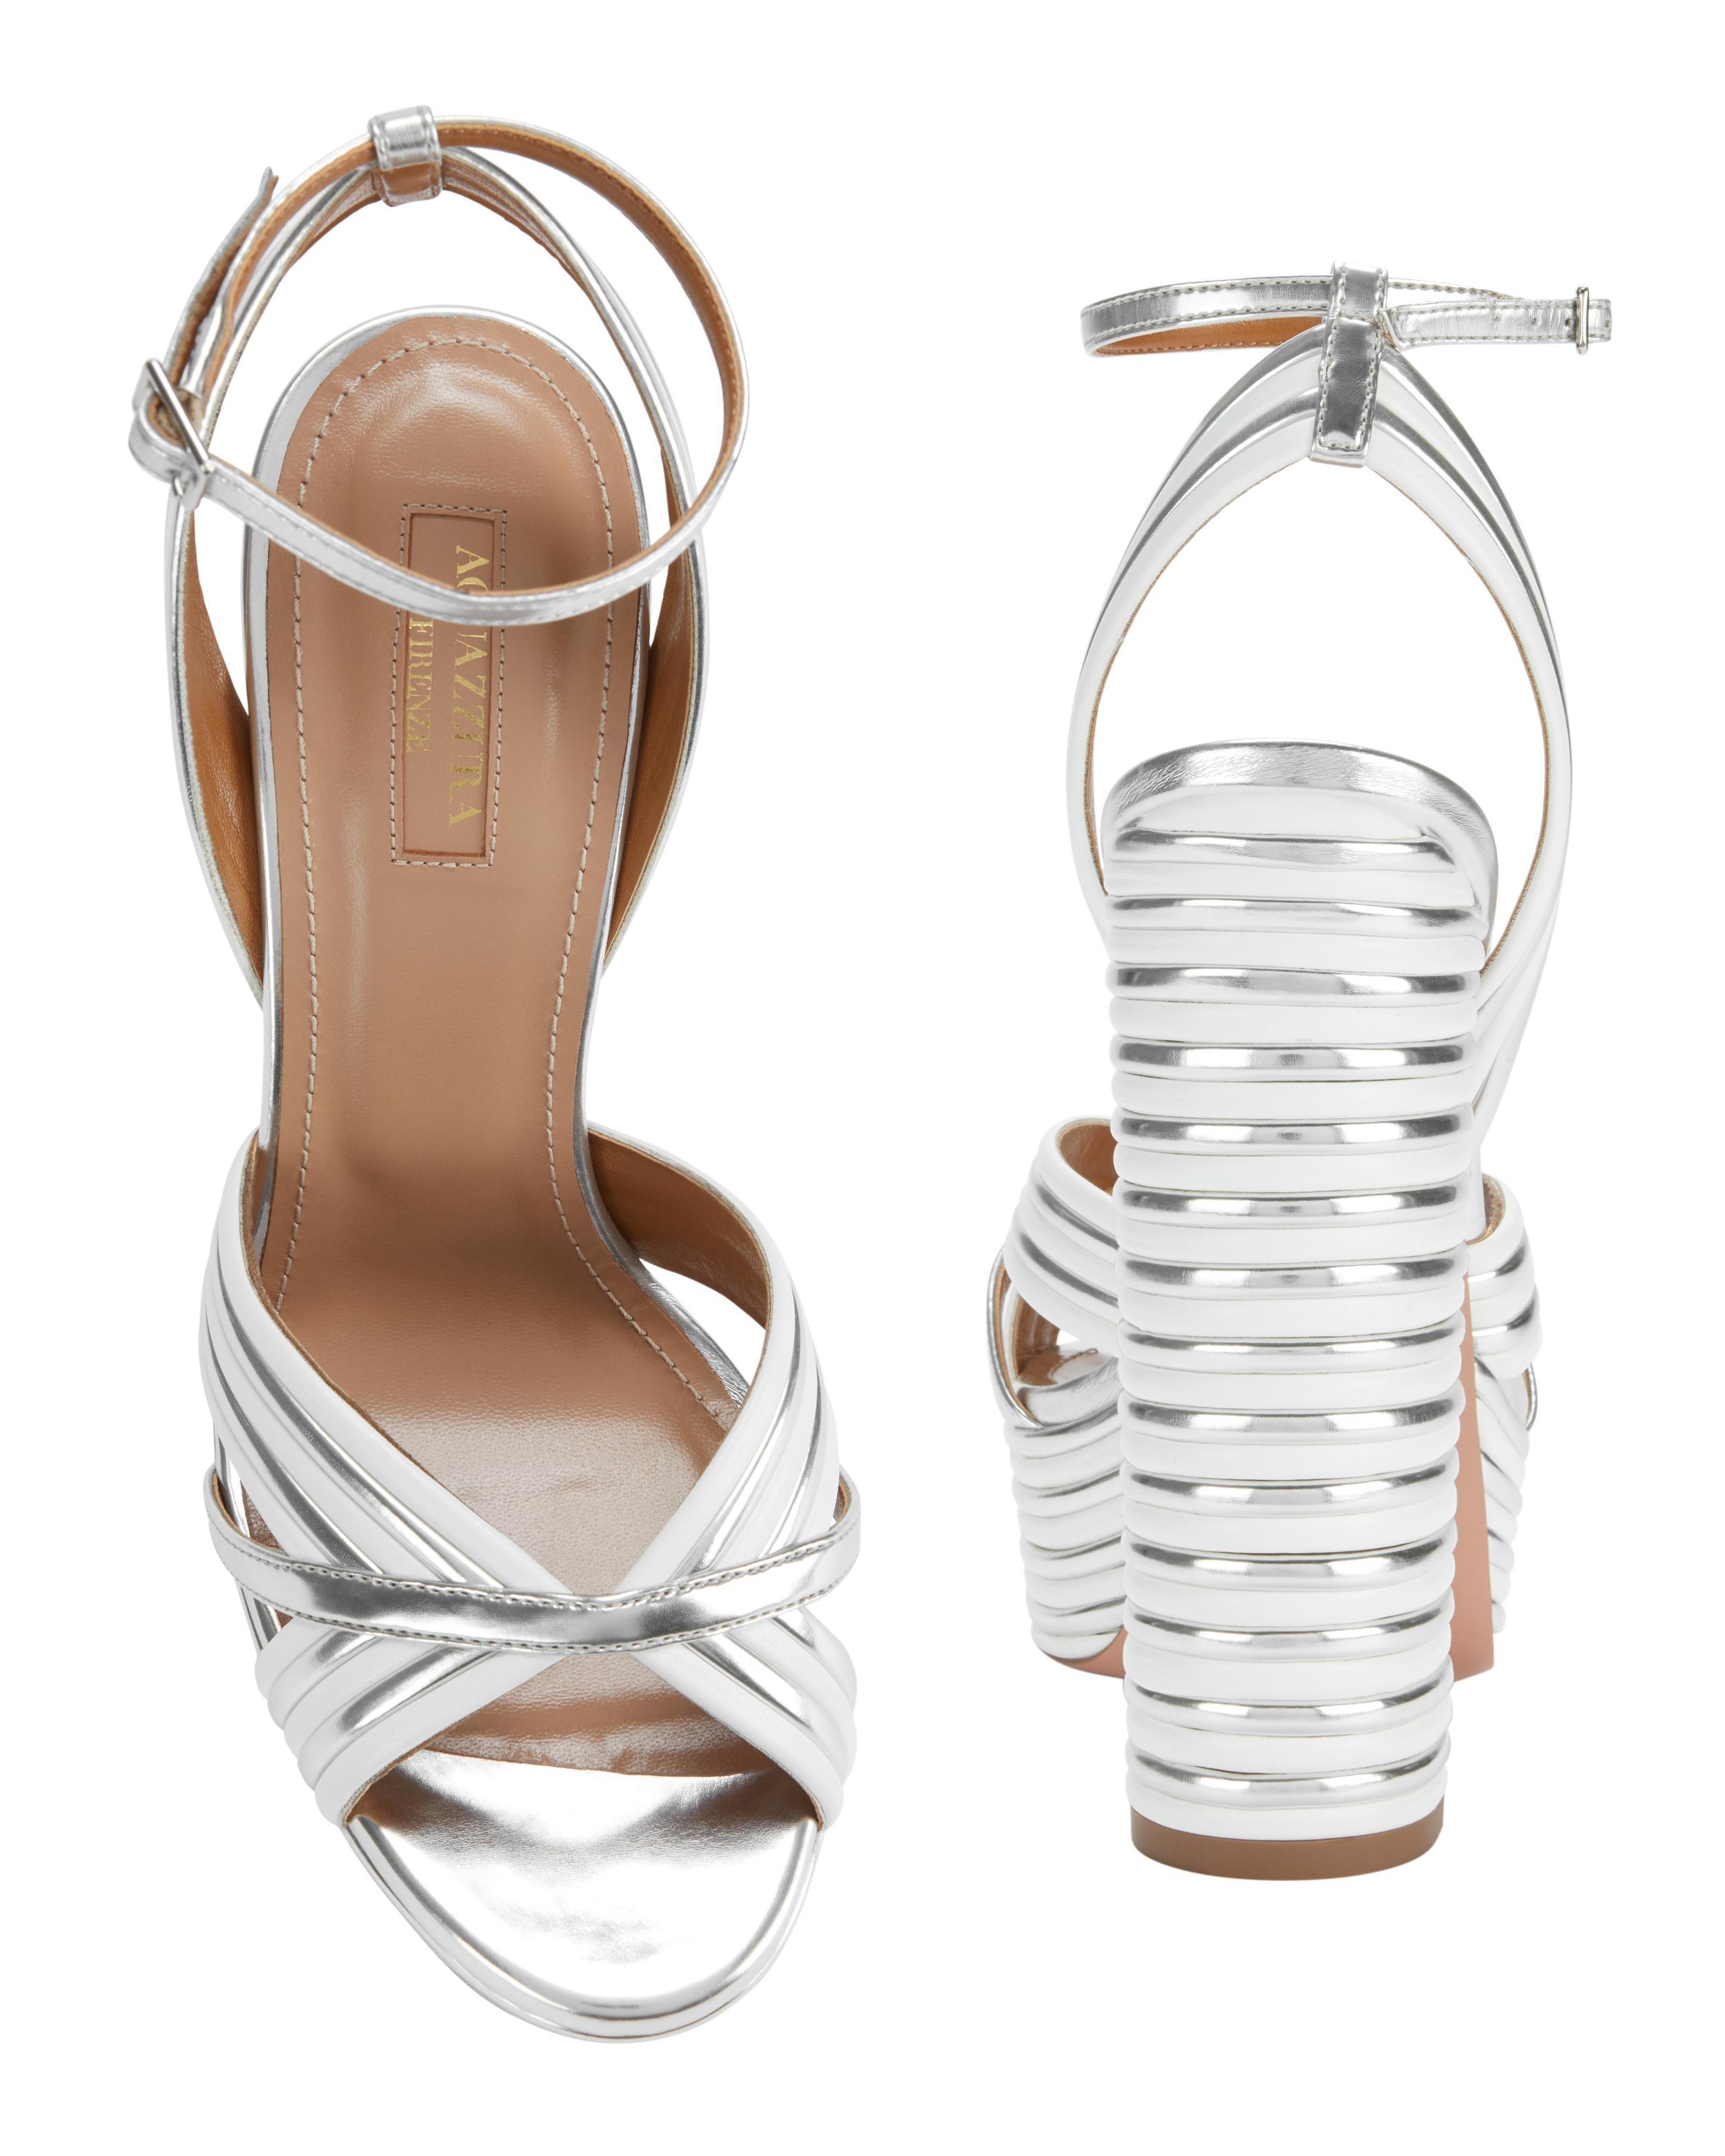 8c885f05ce Aquazzura Sundance Silver Platform Sandals in White - Lyst